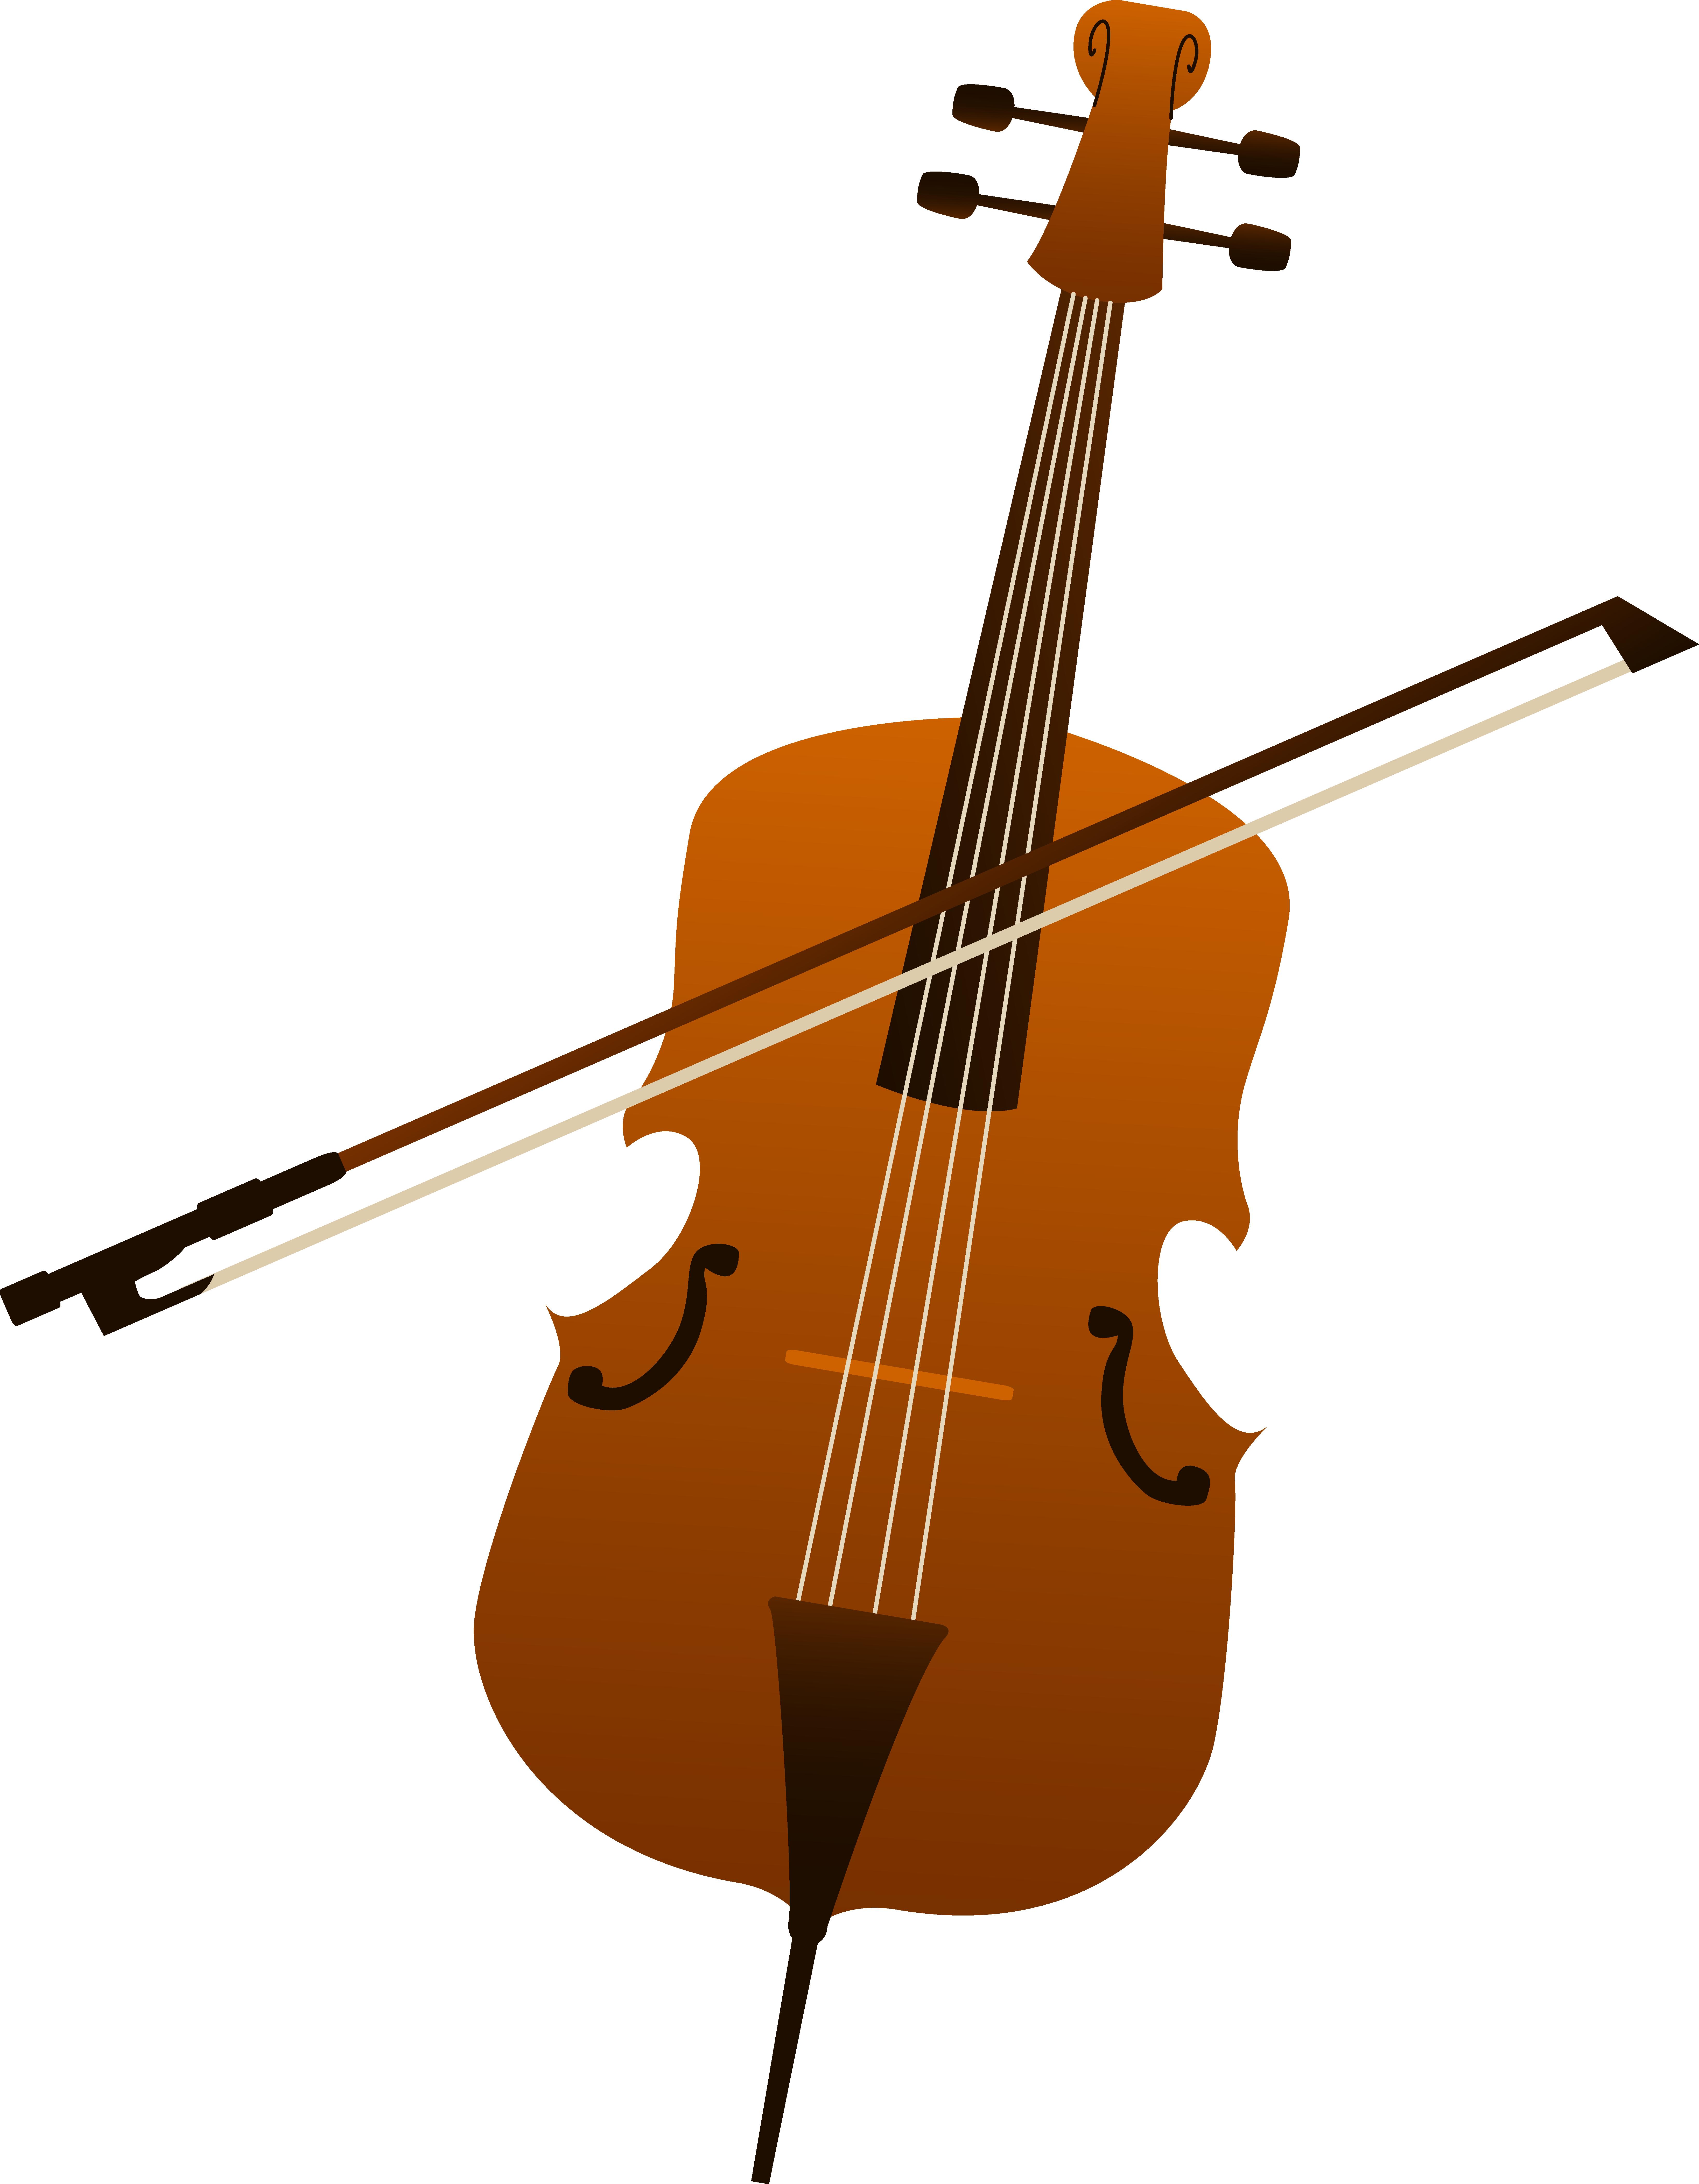 Cello clipart gambar. Cellist panda free images